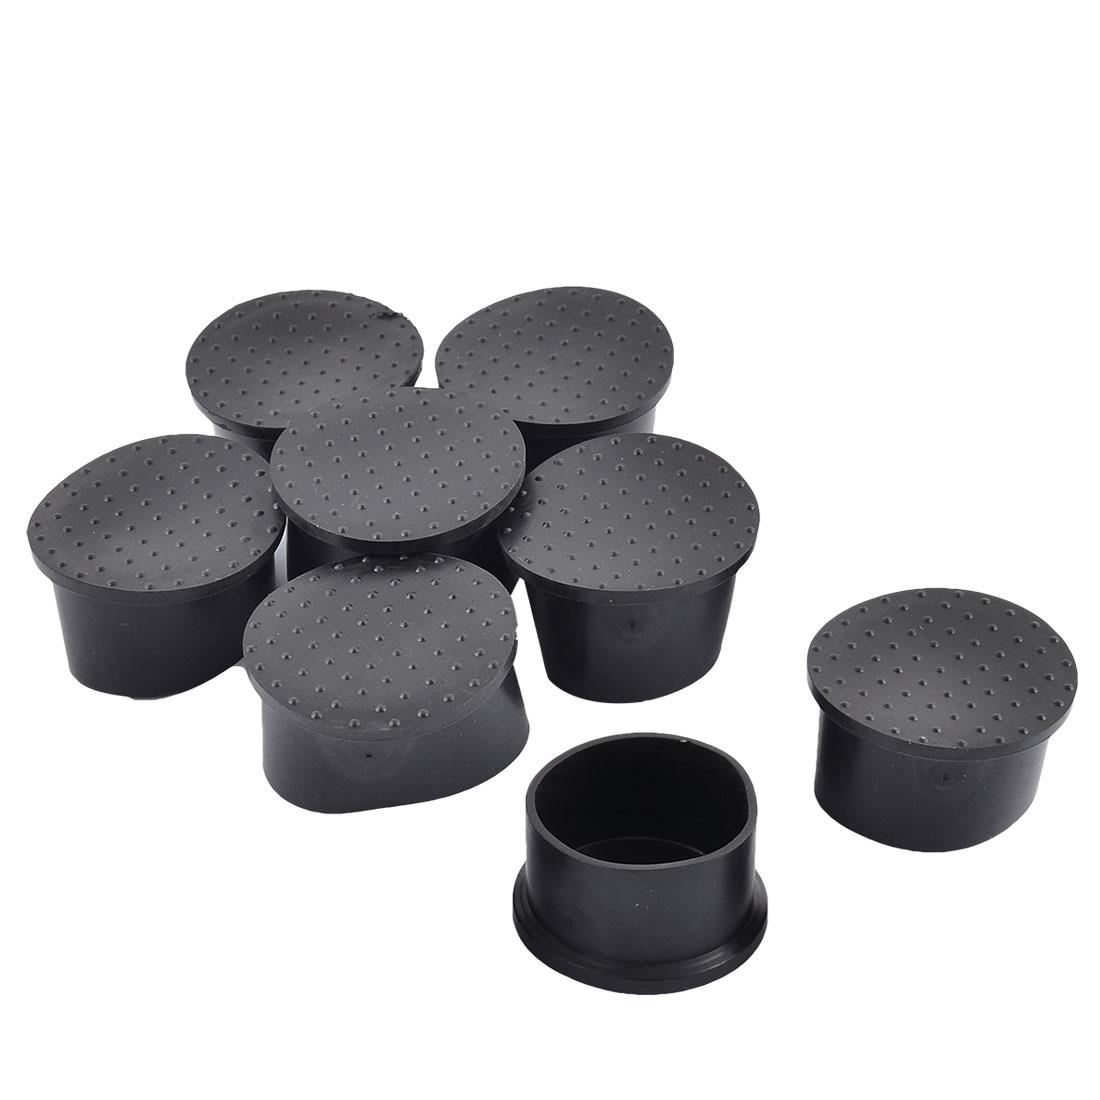 Home Rubber Anti Slip Furniture Table Desk Chair Leg Tips Pads Tool 60mm Base Dia 8pcs